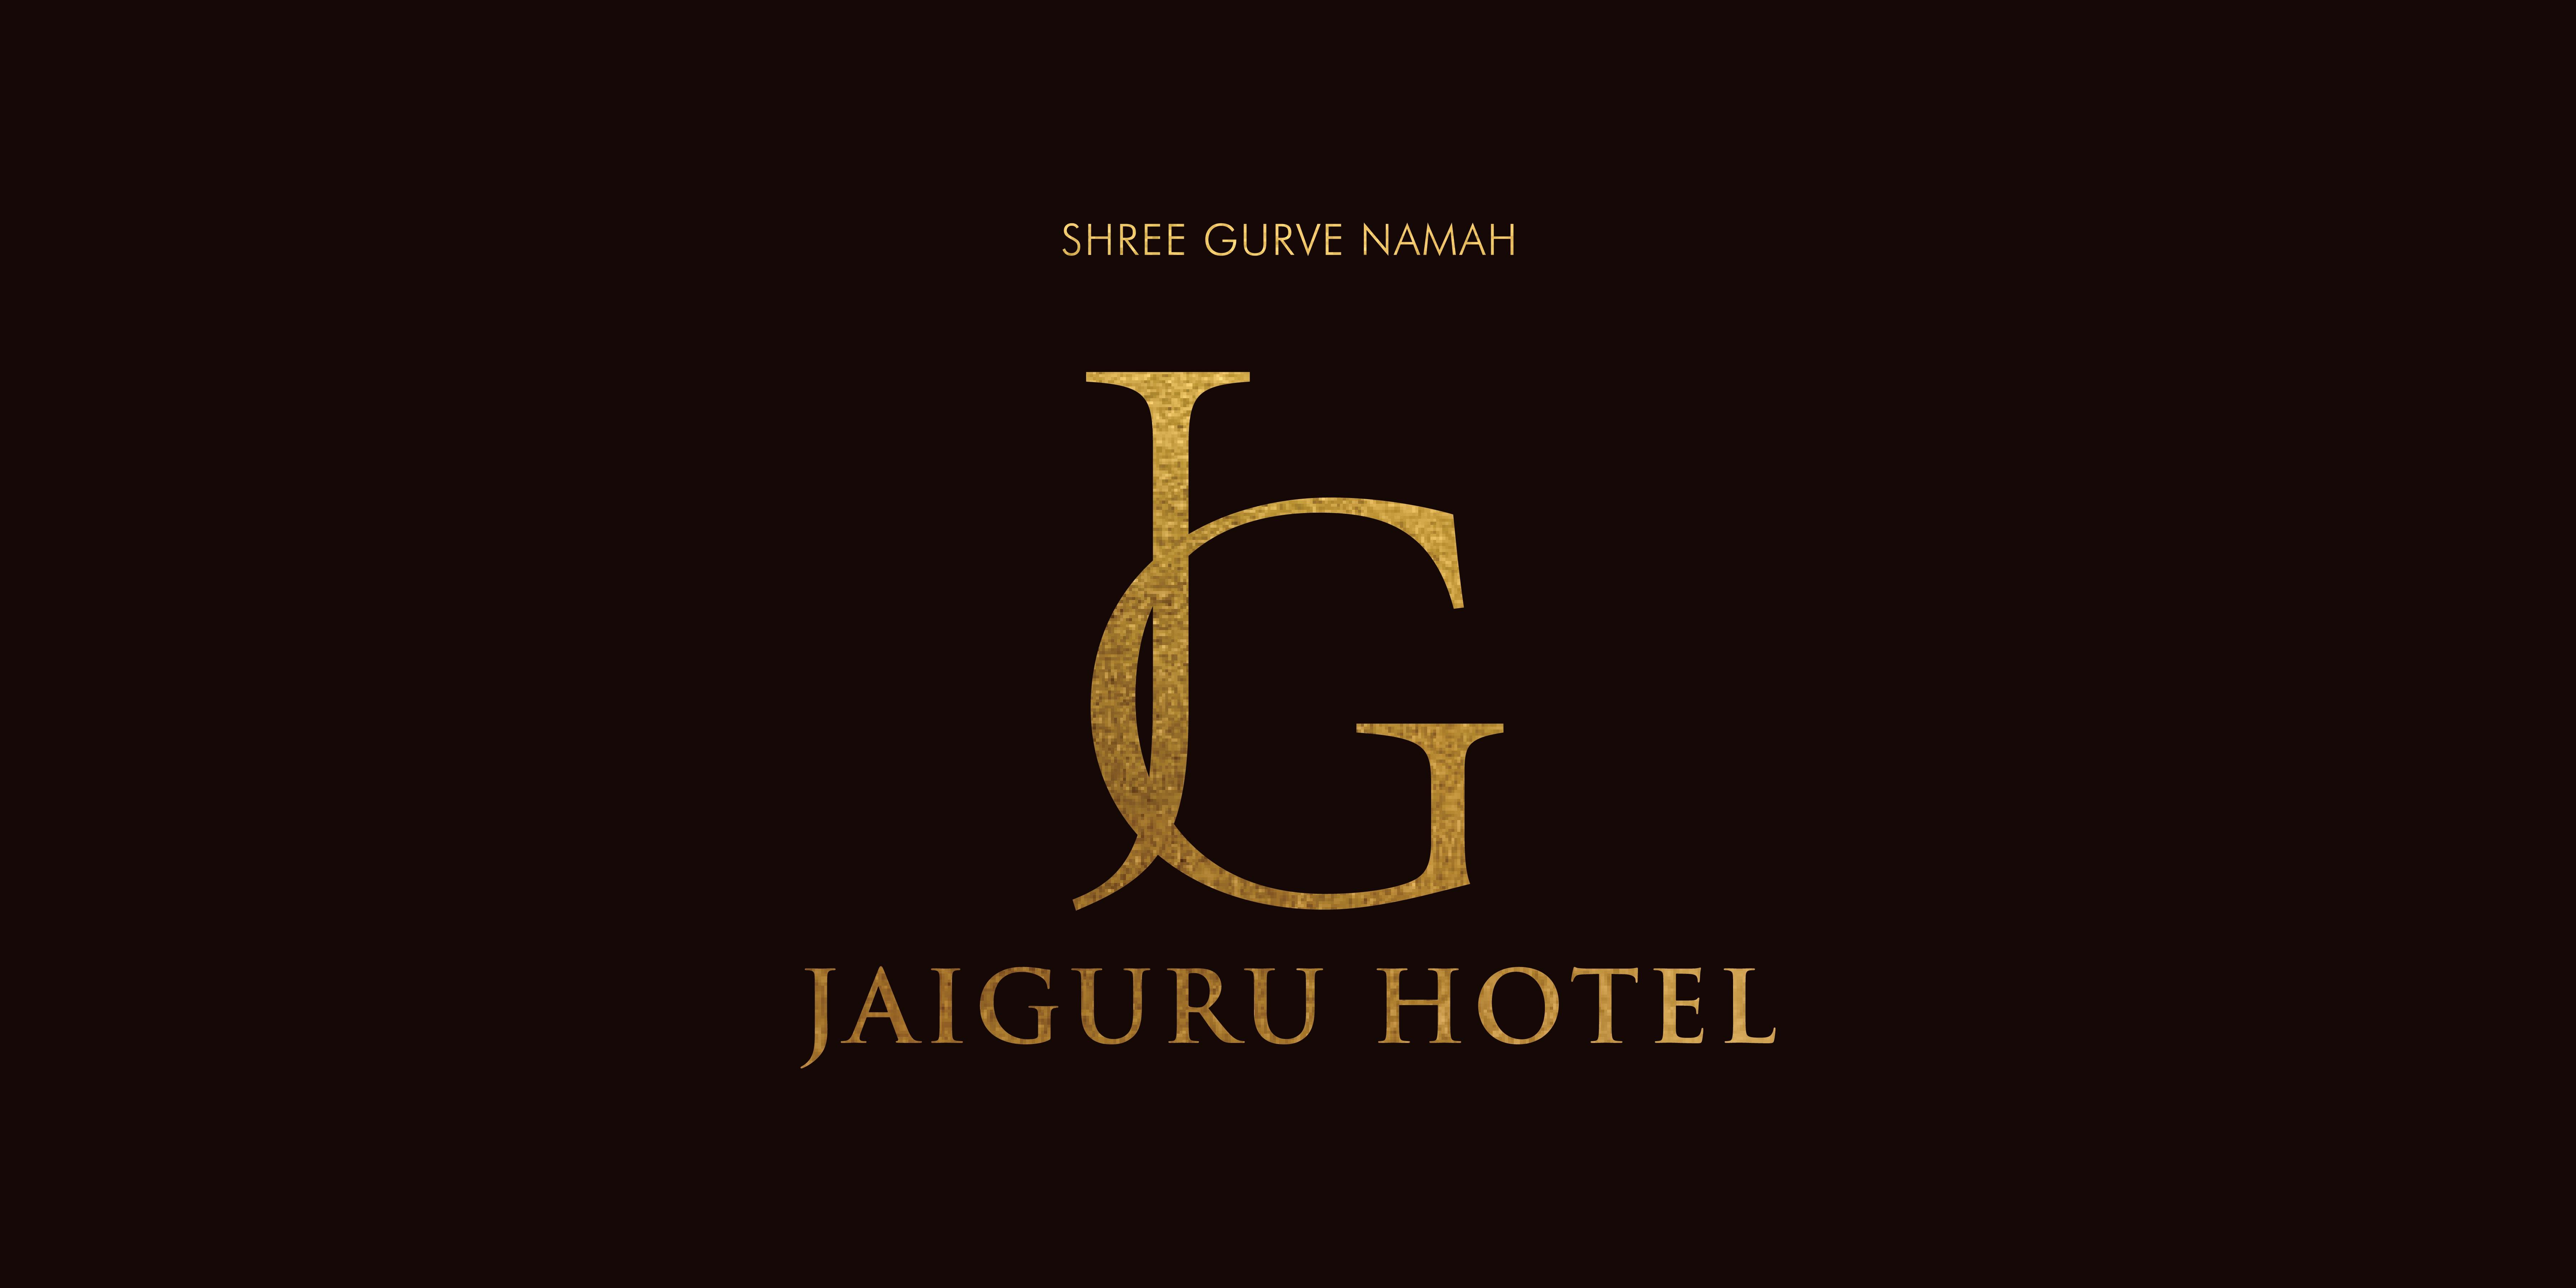 Jaiguru Hotel